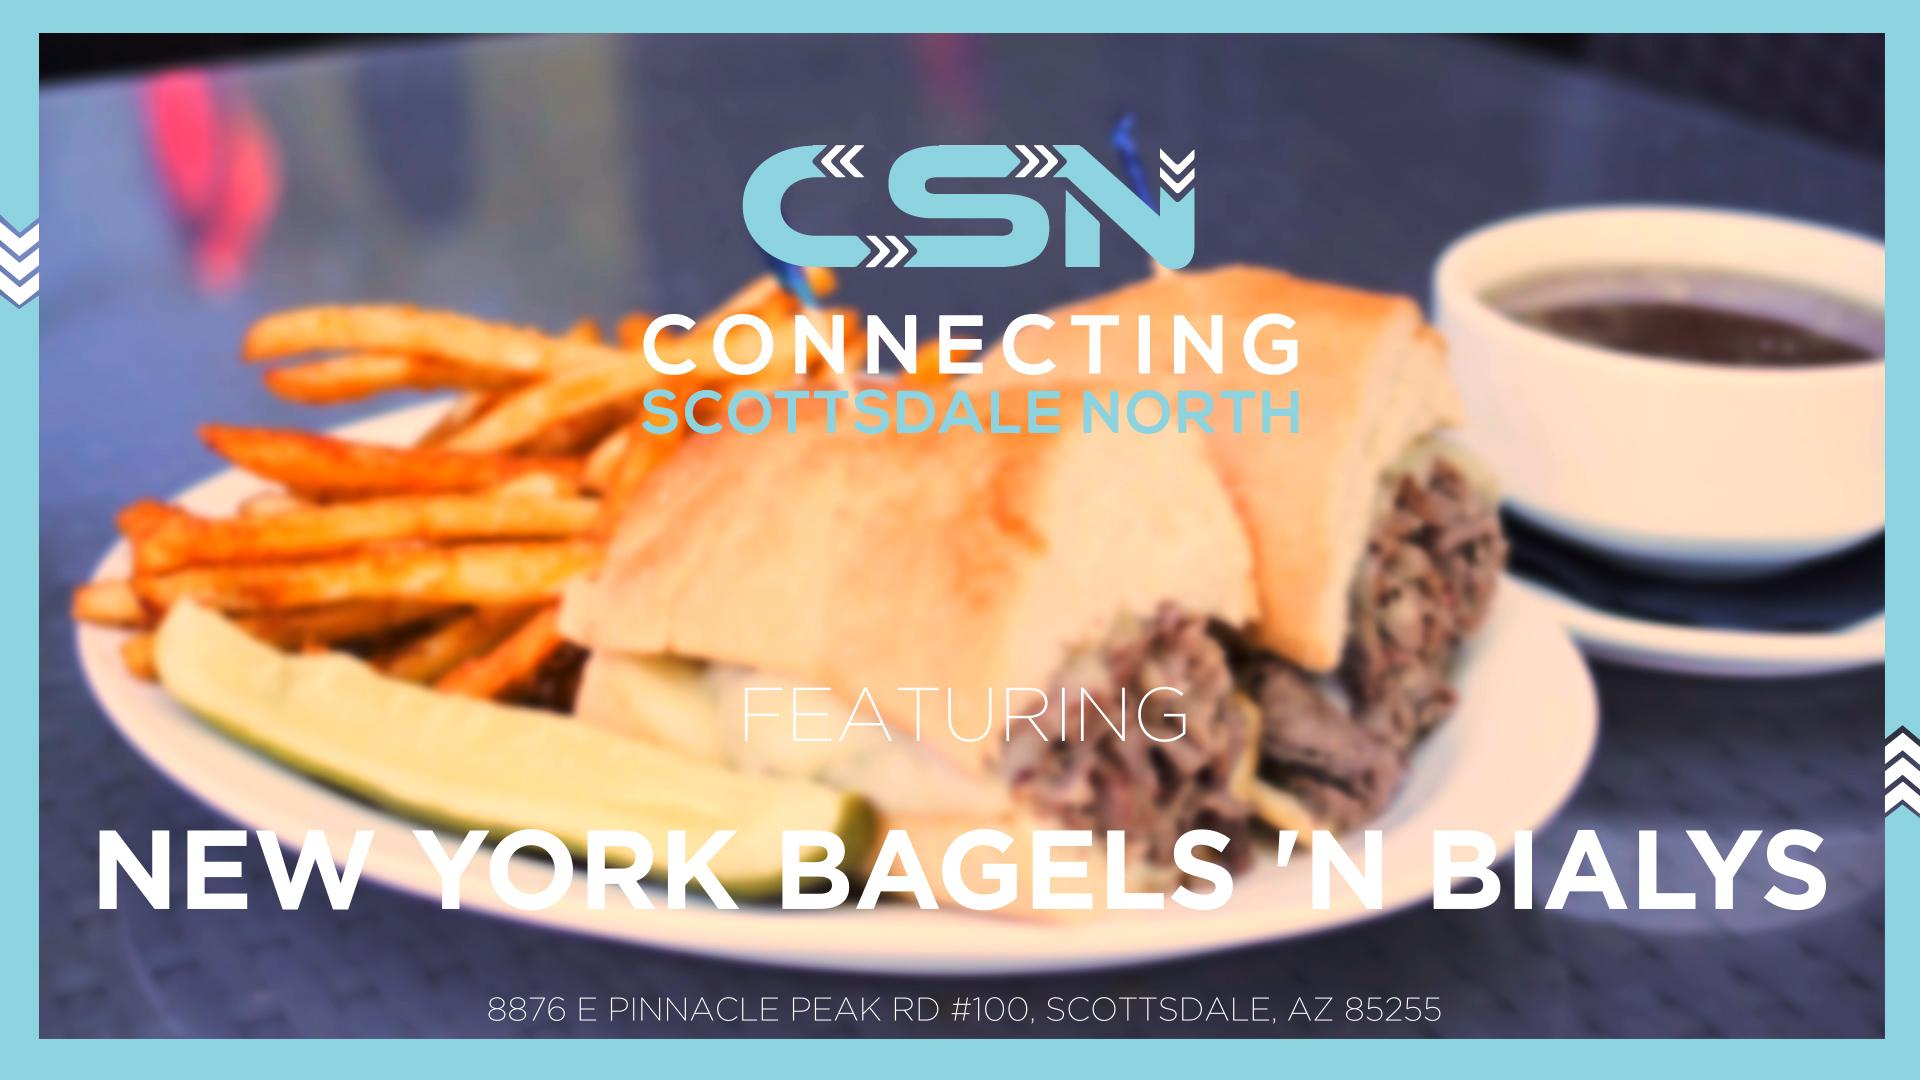 Connecting Scottsdale North | New York Bagels 'N Bialys